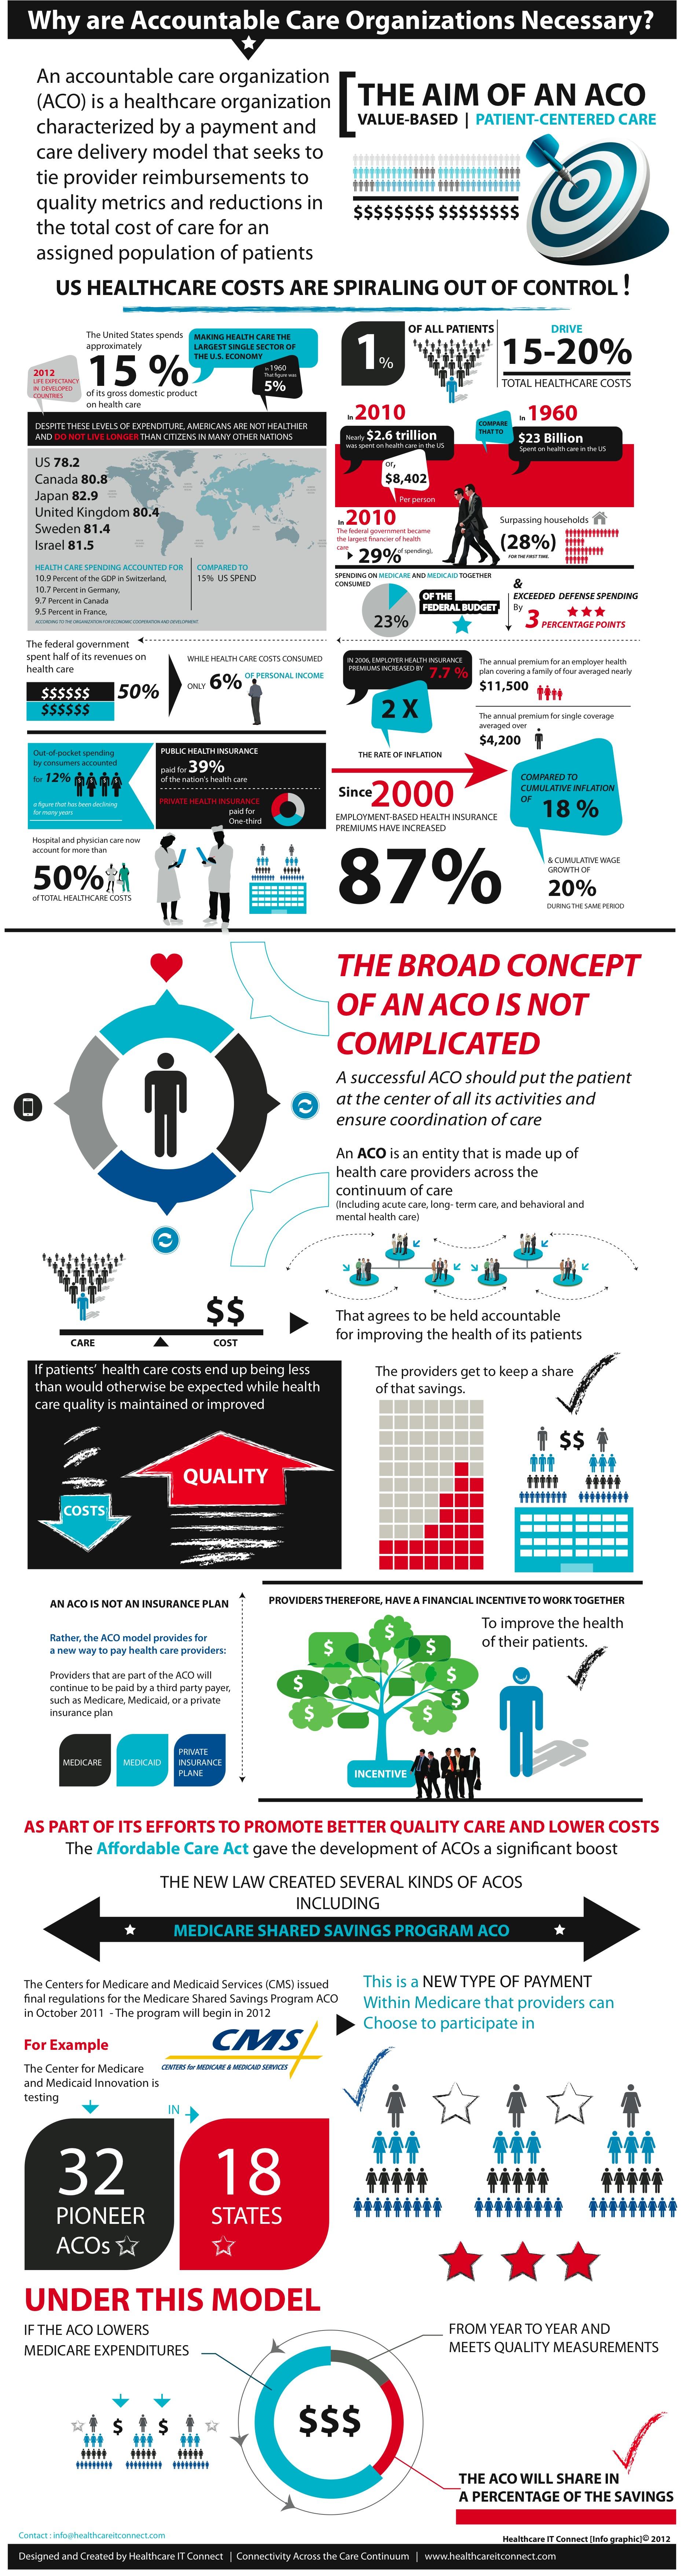 aco, Definition Thursday: Accountable Care Organization (ACO) Infographic